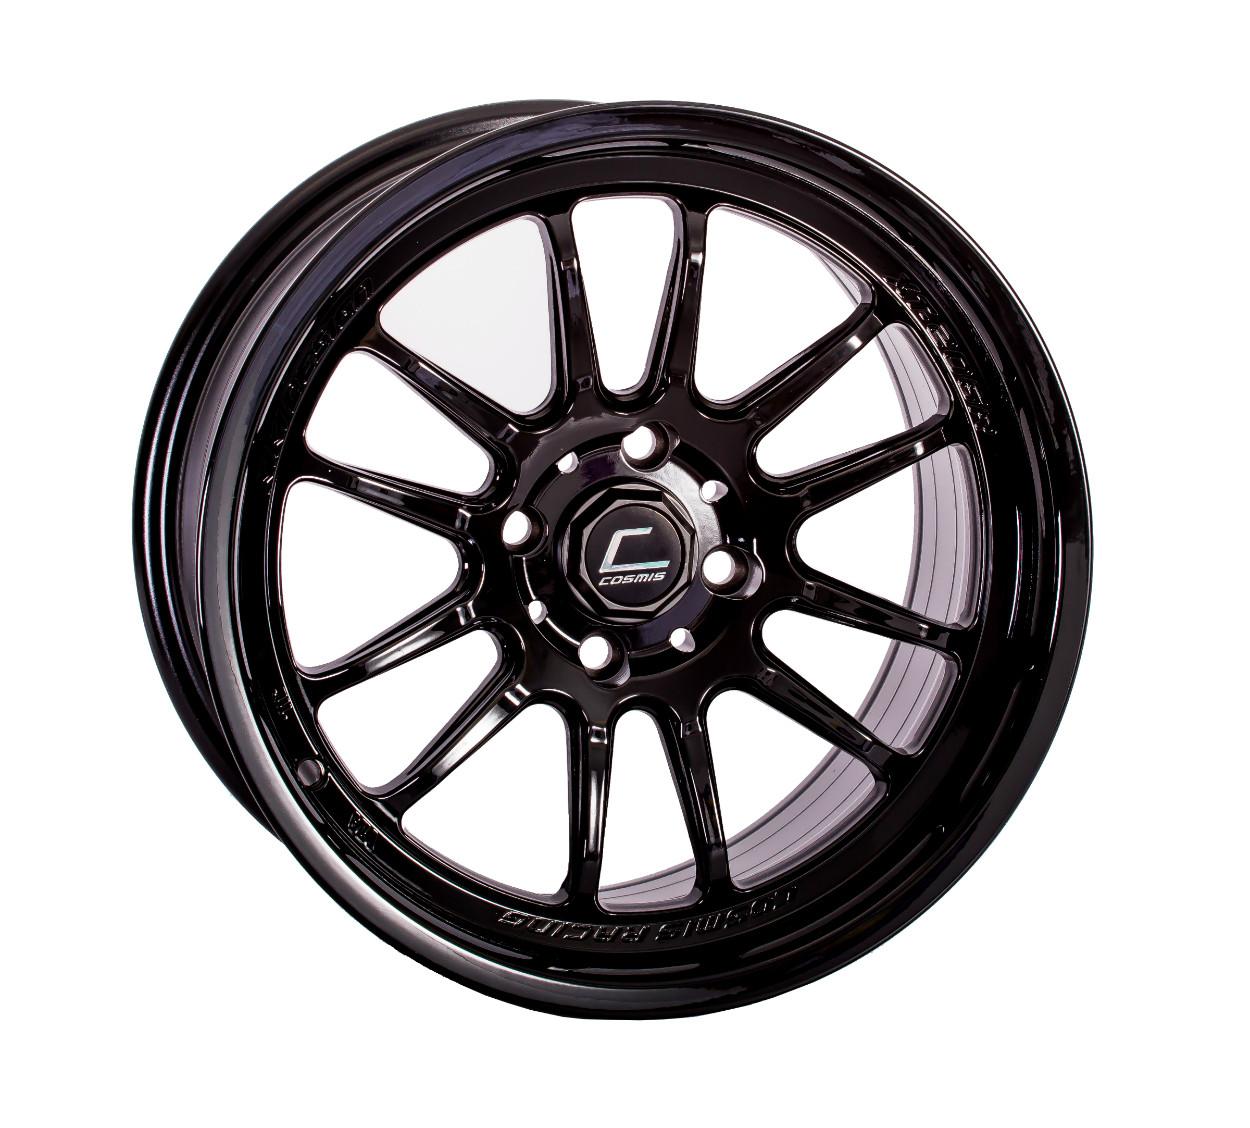 "Cosmis Racing XT-206R Wheel in 15x8"" - Black"